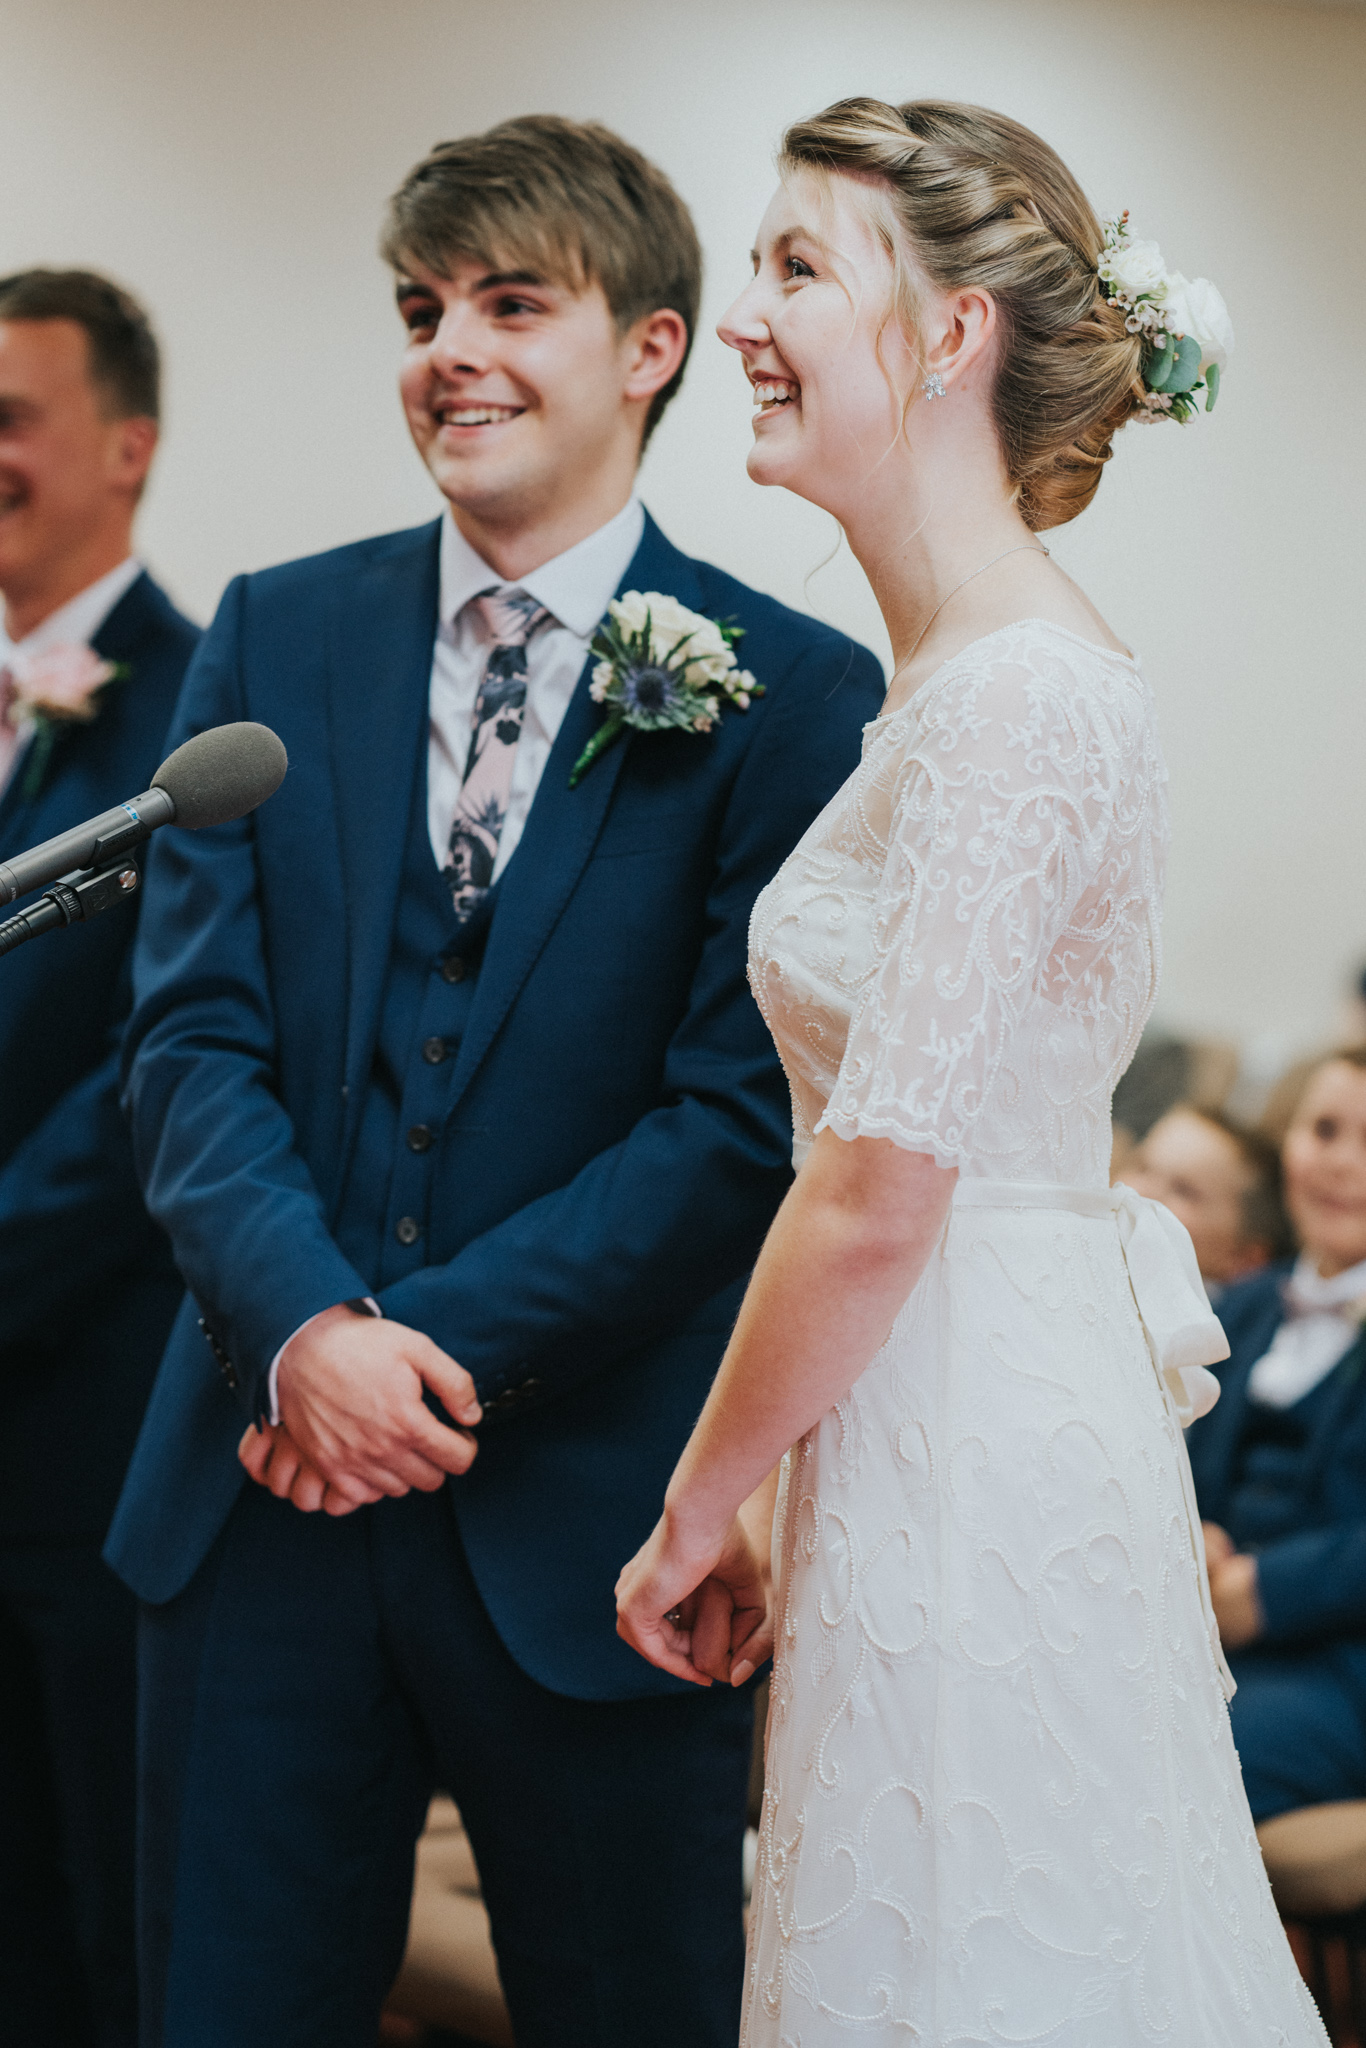 Jess-and-Tom-Norfolk-Alternative-Wedding-Essex-Wedding-Photographer-Grace-Elizabeth-11.jpg